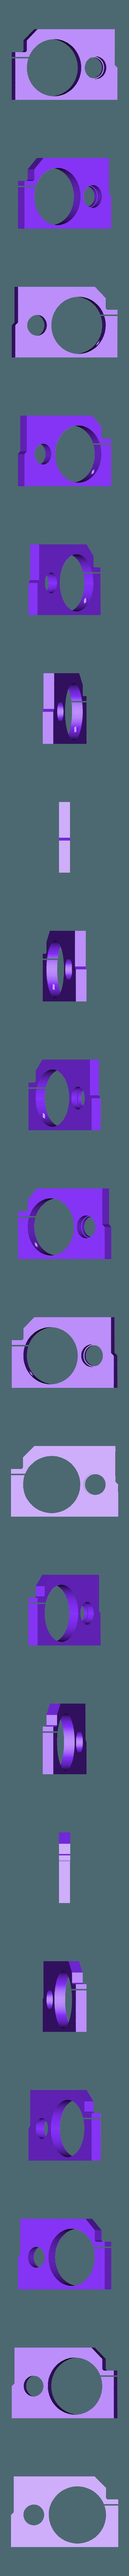 BSR_BERSERKER_Motor_Mount_20190311.stl Download free STL file BSR Berserker Motor Mount & Adjustor • 3D printer design, peterbroeders